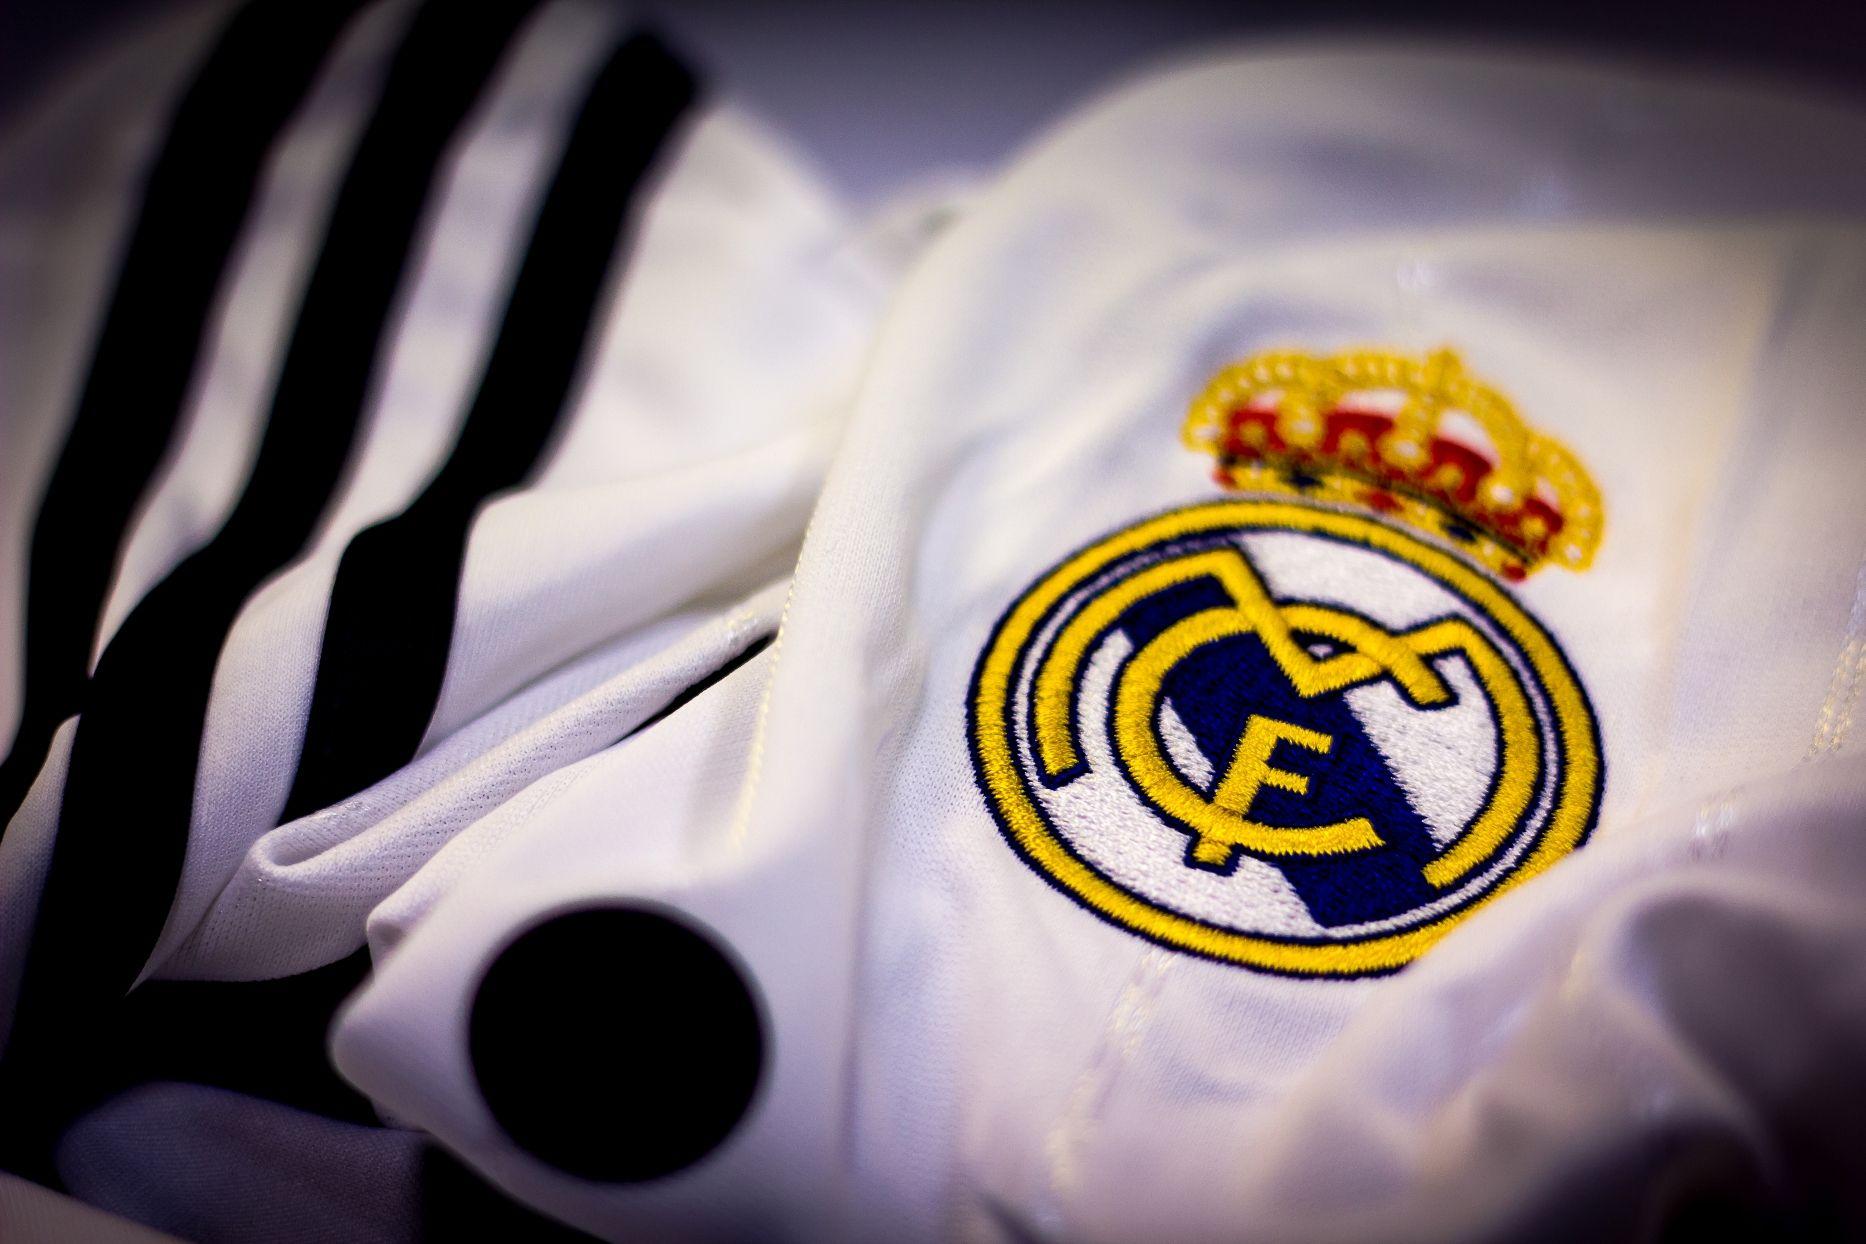 Real Madrid Club De Futbol Madrid Wallpaper 2021 Live Wallpaper Hd Real Madrid Logo Wallpapers Real Madrid Wallpapers Real Madrid Logo